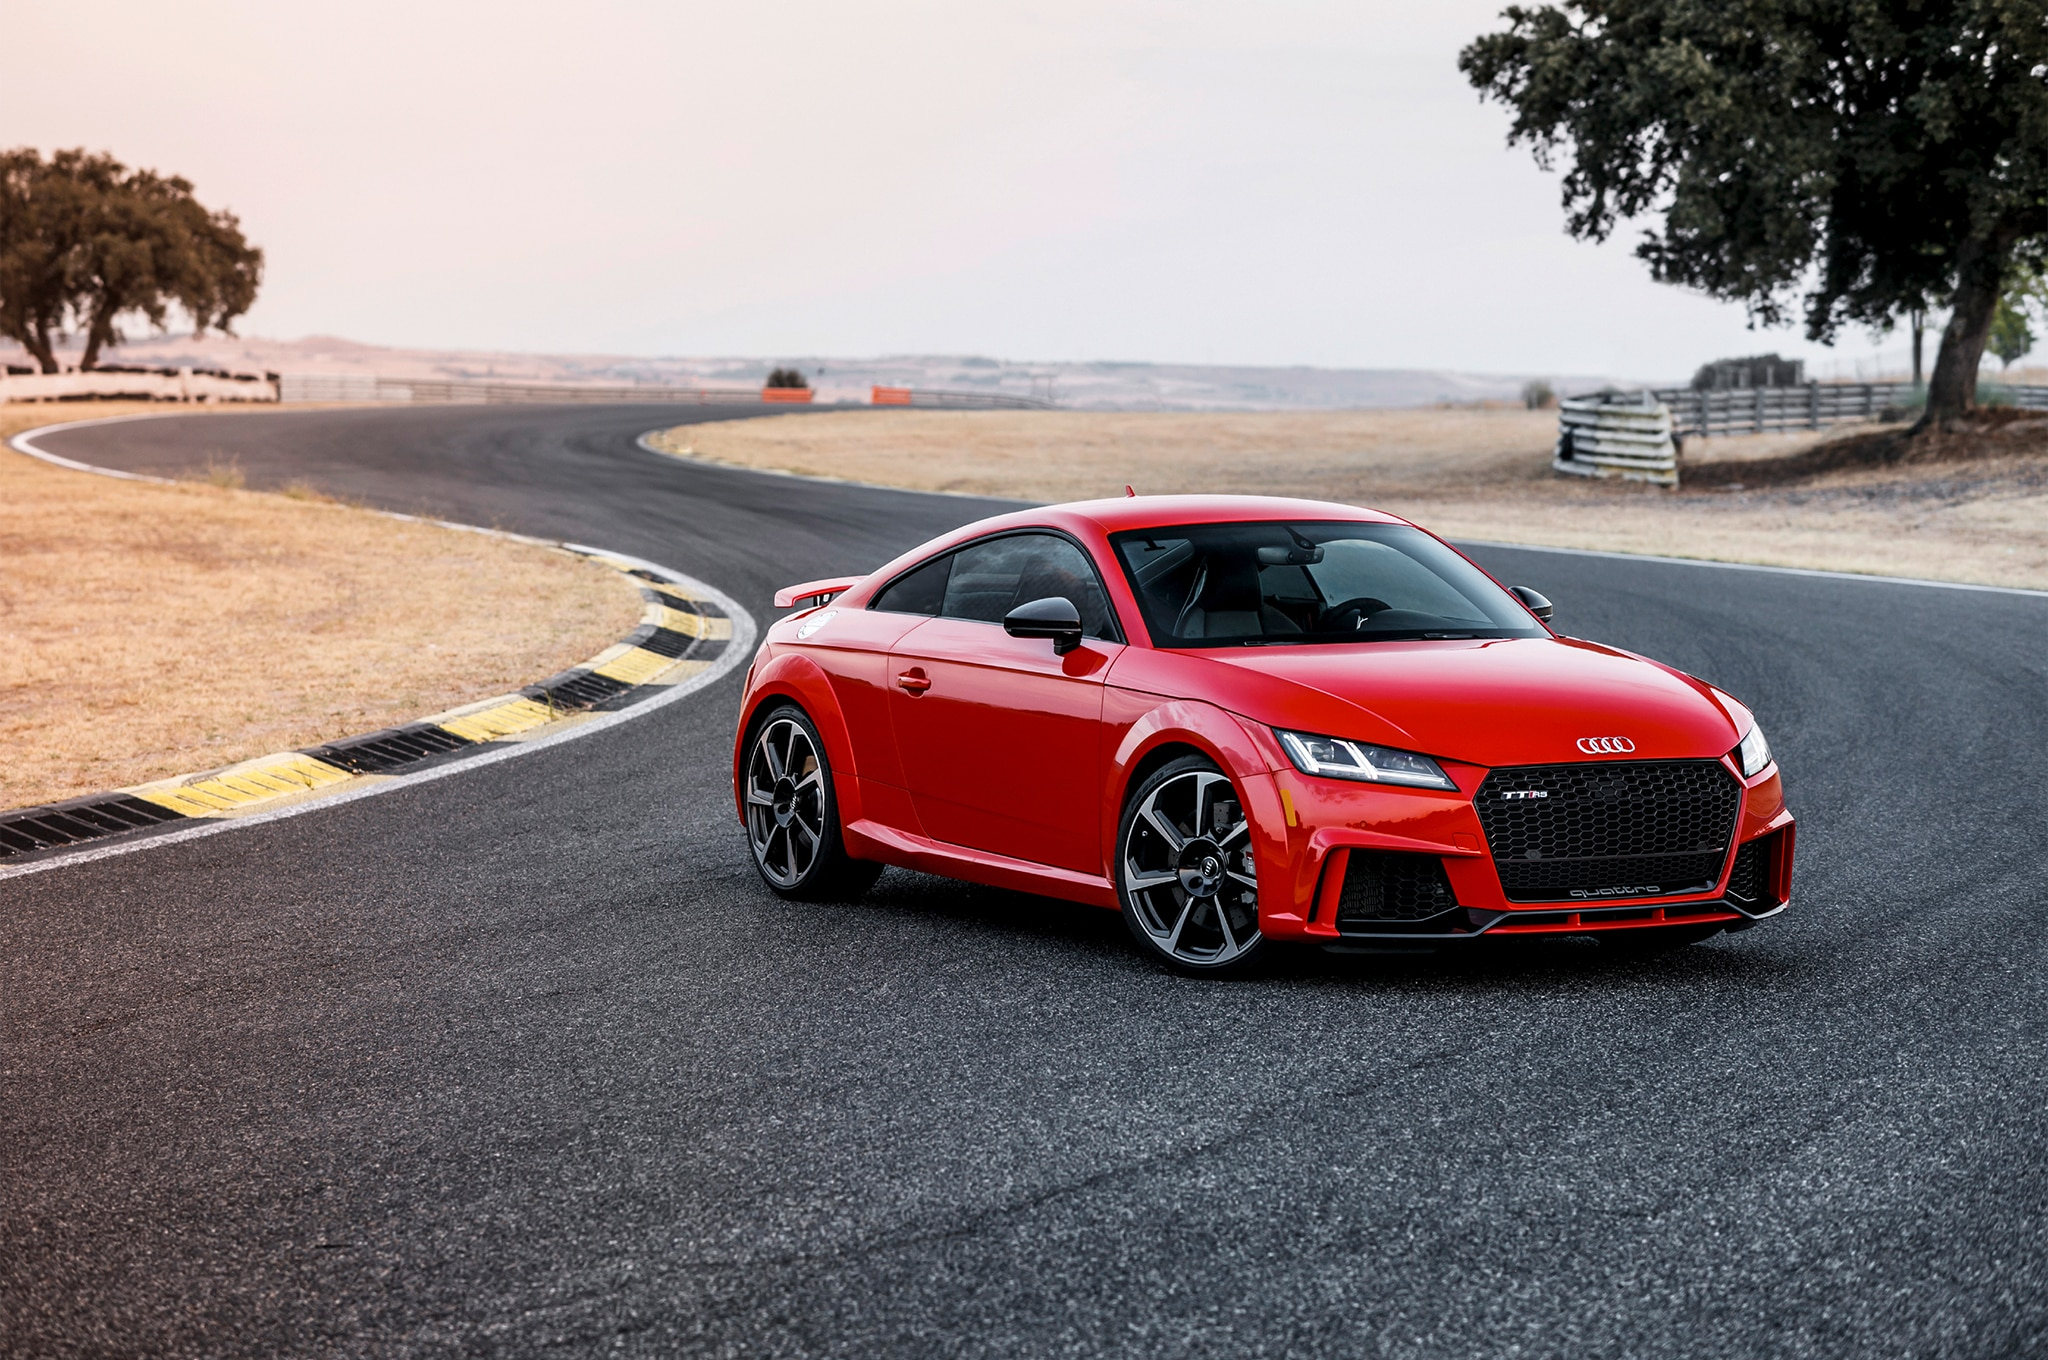 2018 audi tt rs u.s. spec first drive review | automobile magazine